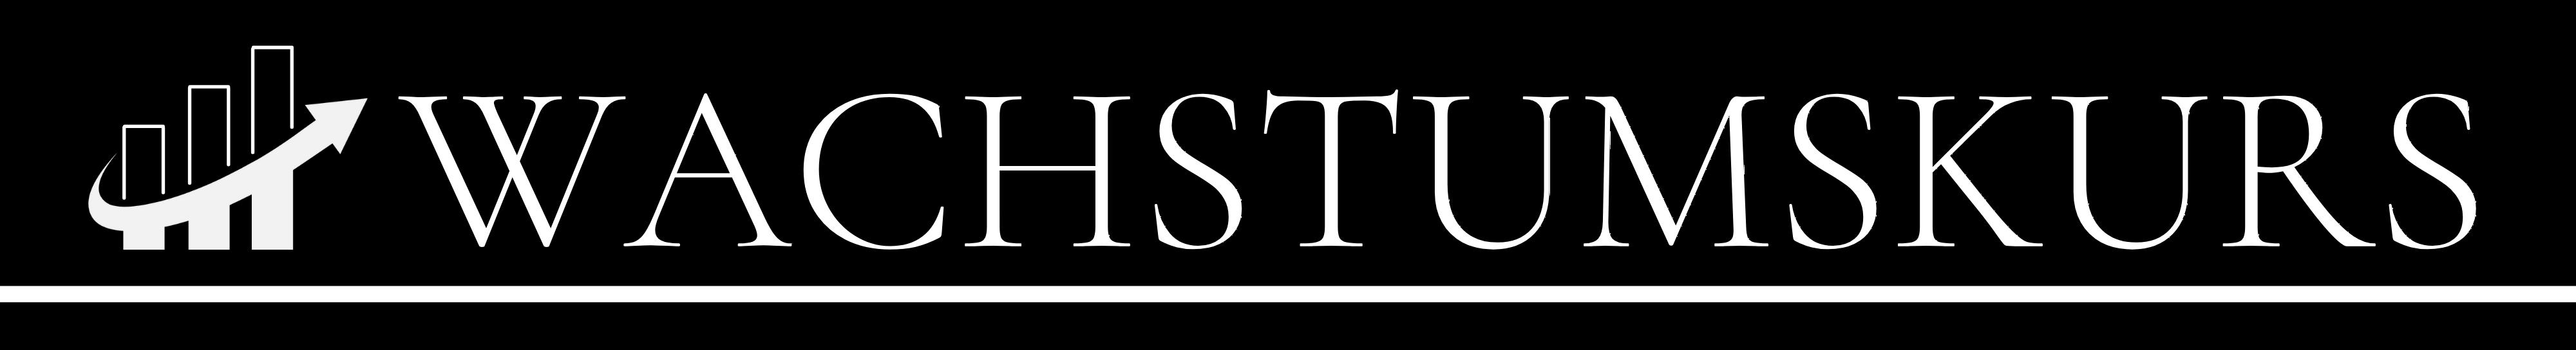 Wachstumskurs Logo weiß